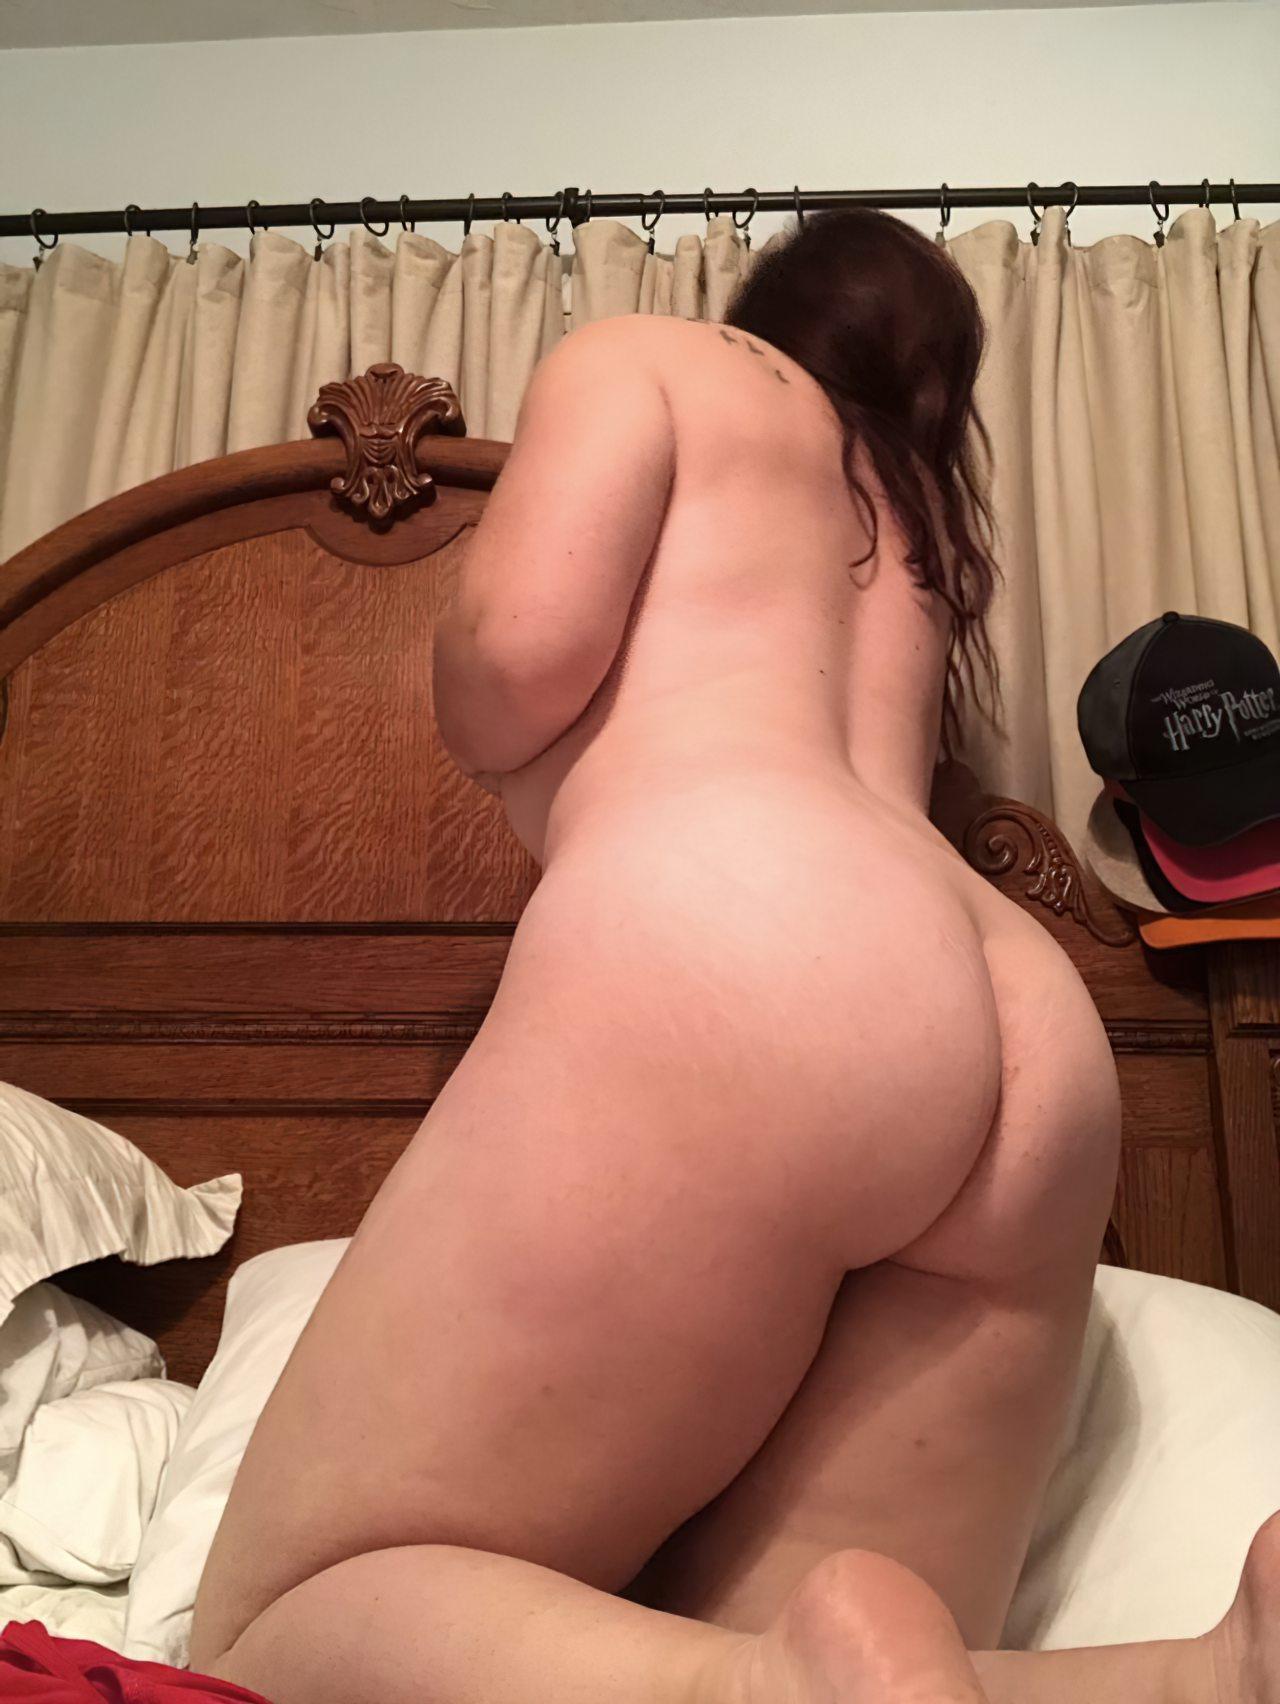 Nudes na Cama (2)